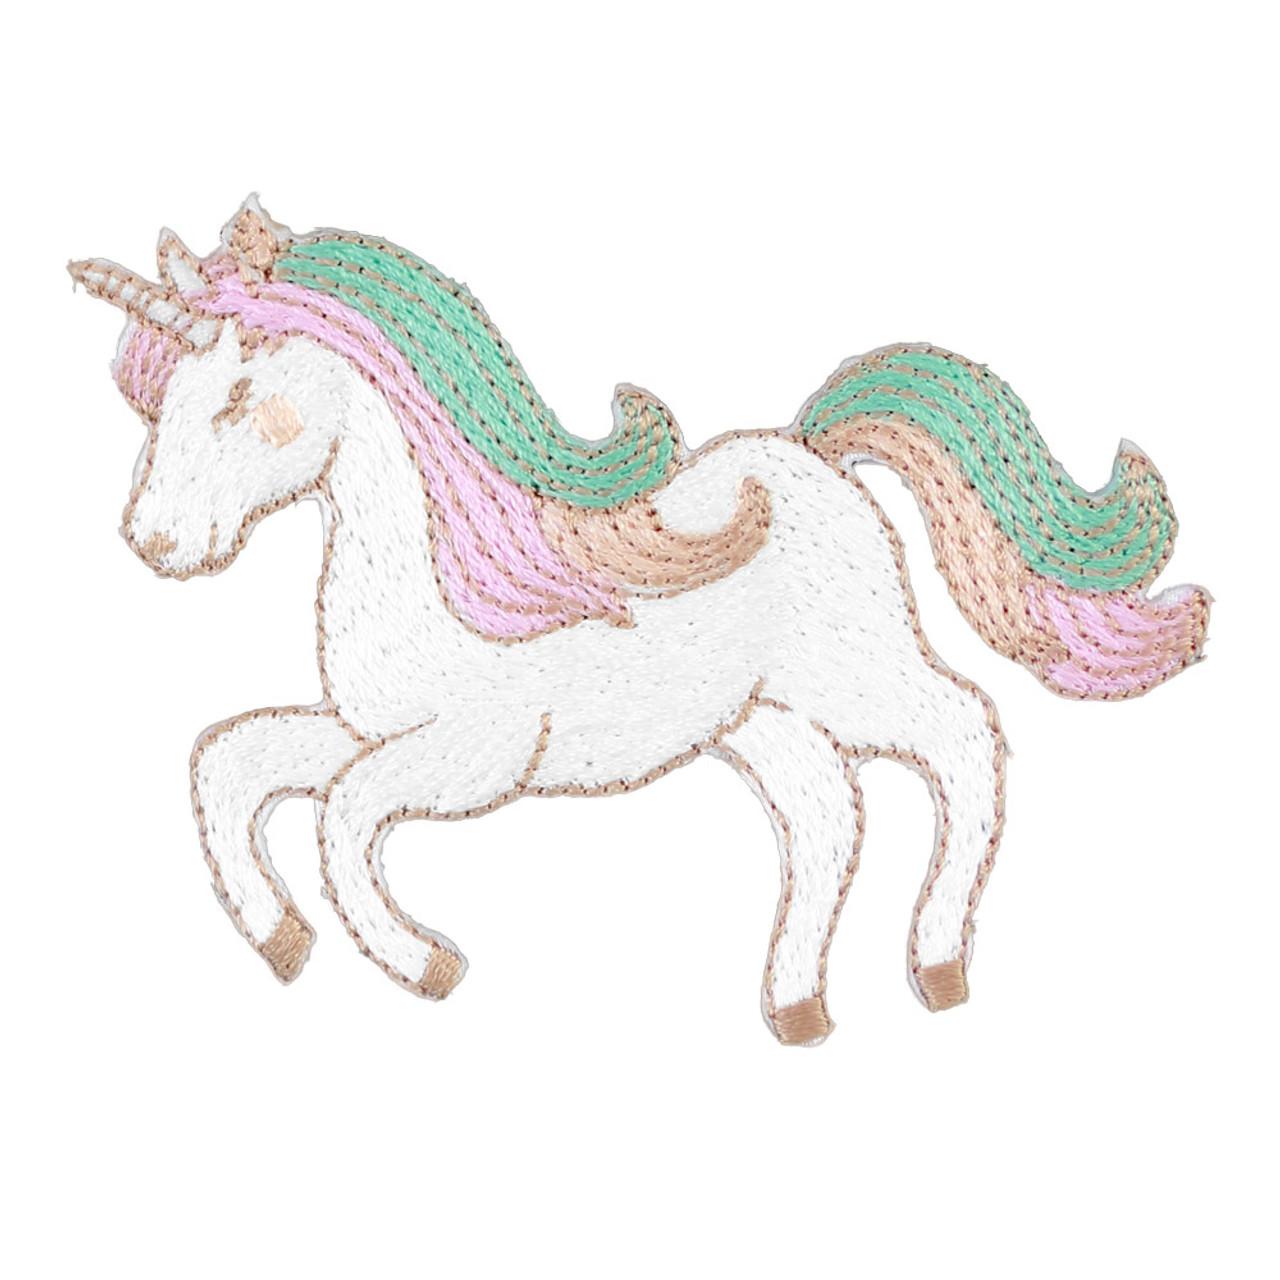 Kawaii Fantasy Unicorn Iron On Patch ( Front View )